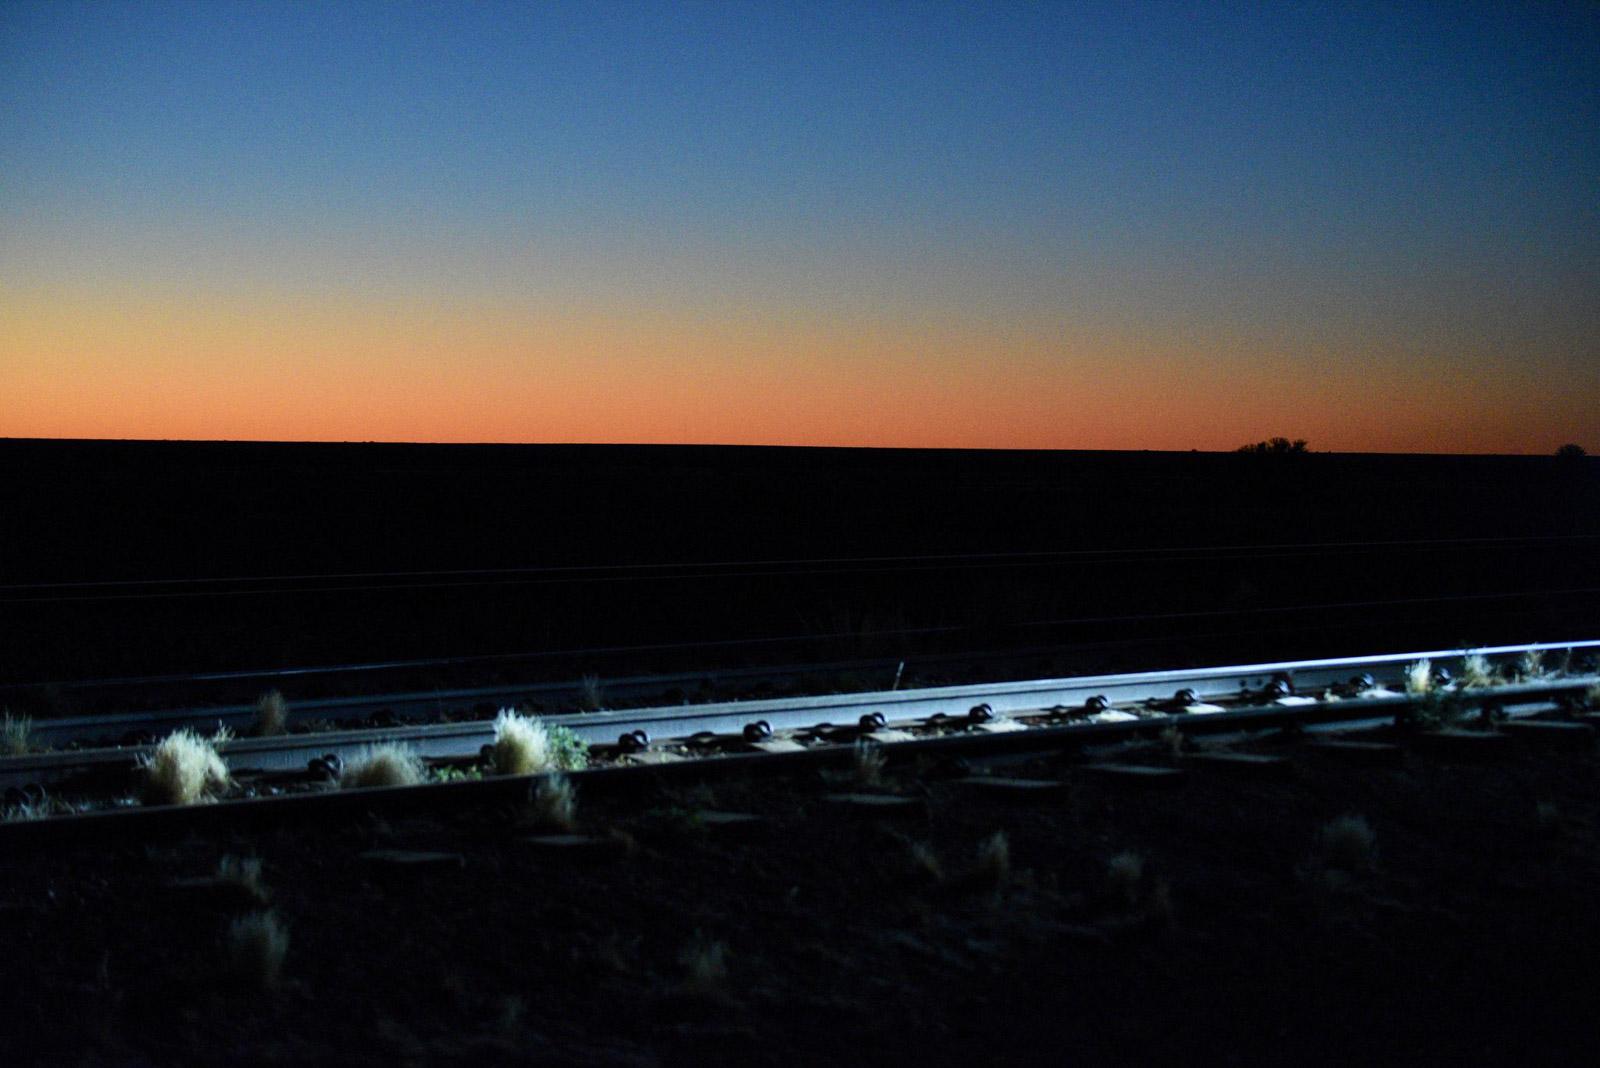 The Ghan railway tracks in Australia